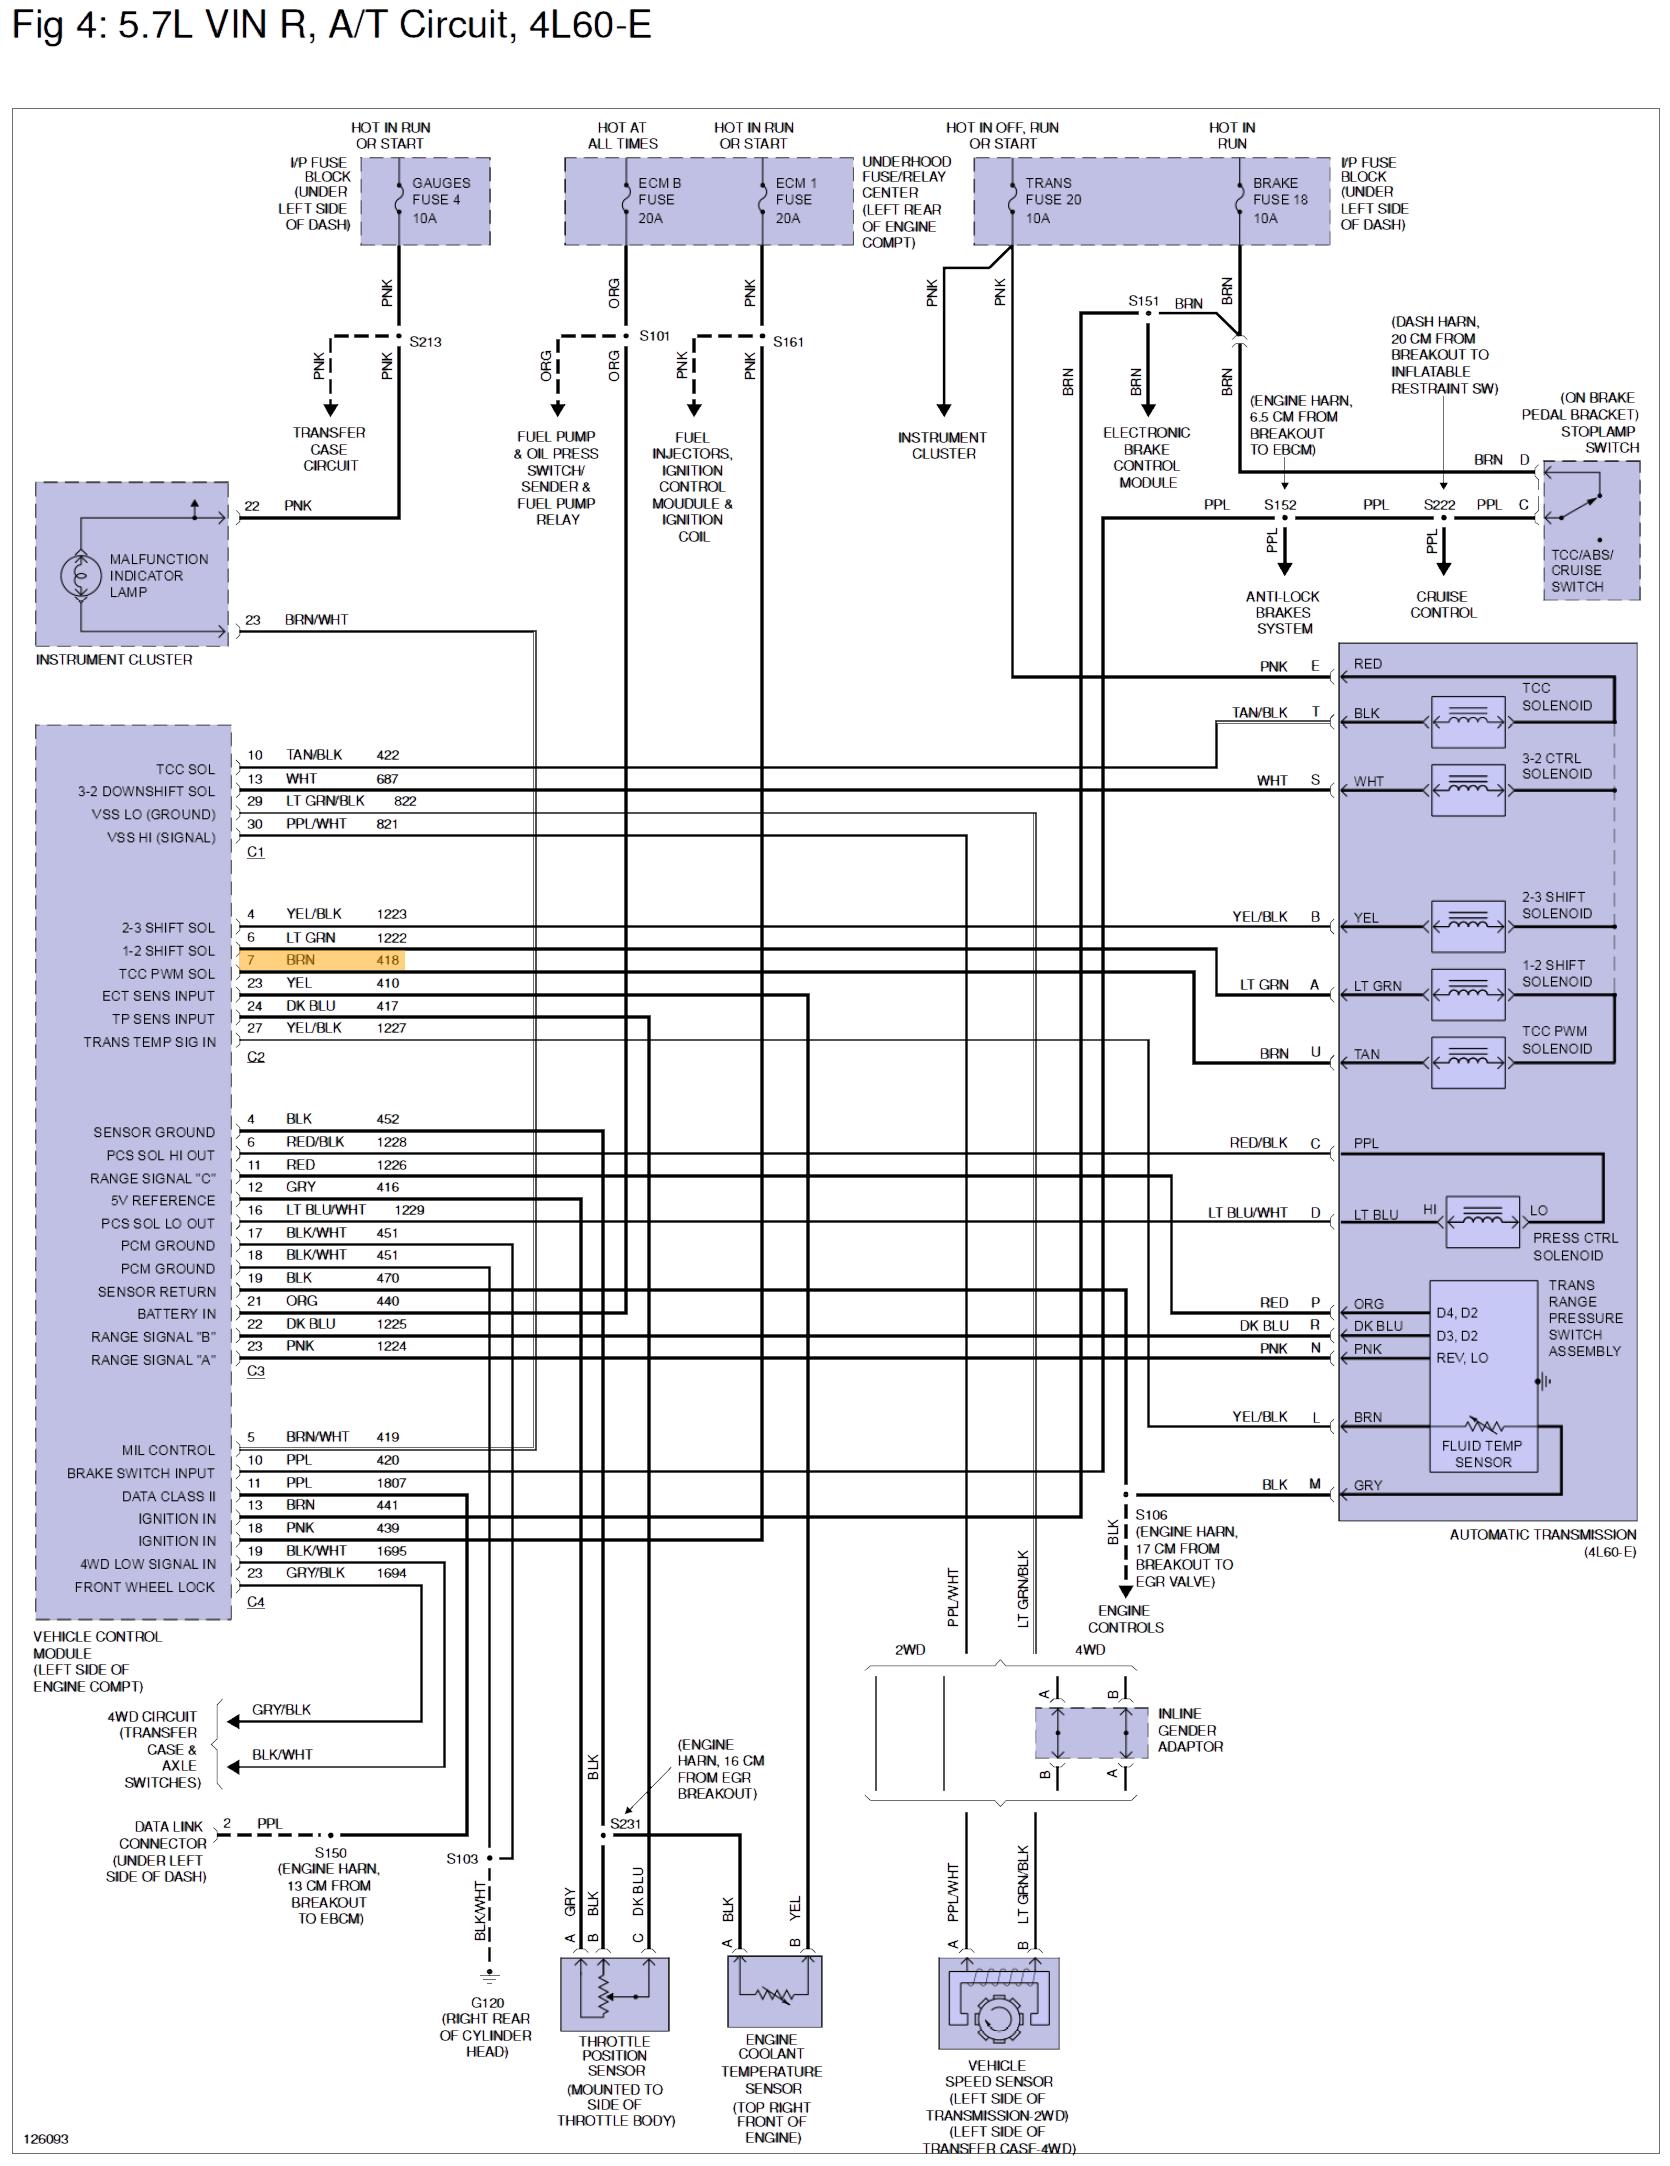 Wiring M610 Sony Diagram Harness Serial Cdx 3539766 - Wiring Diagram